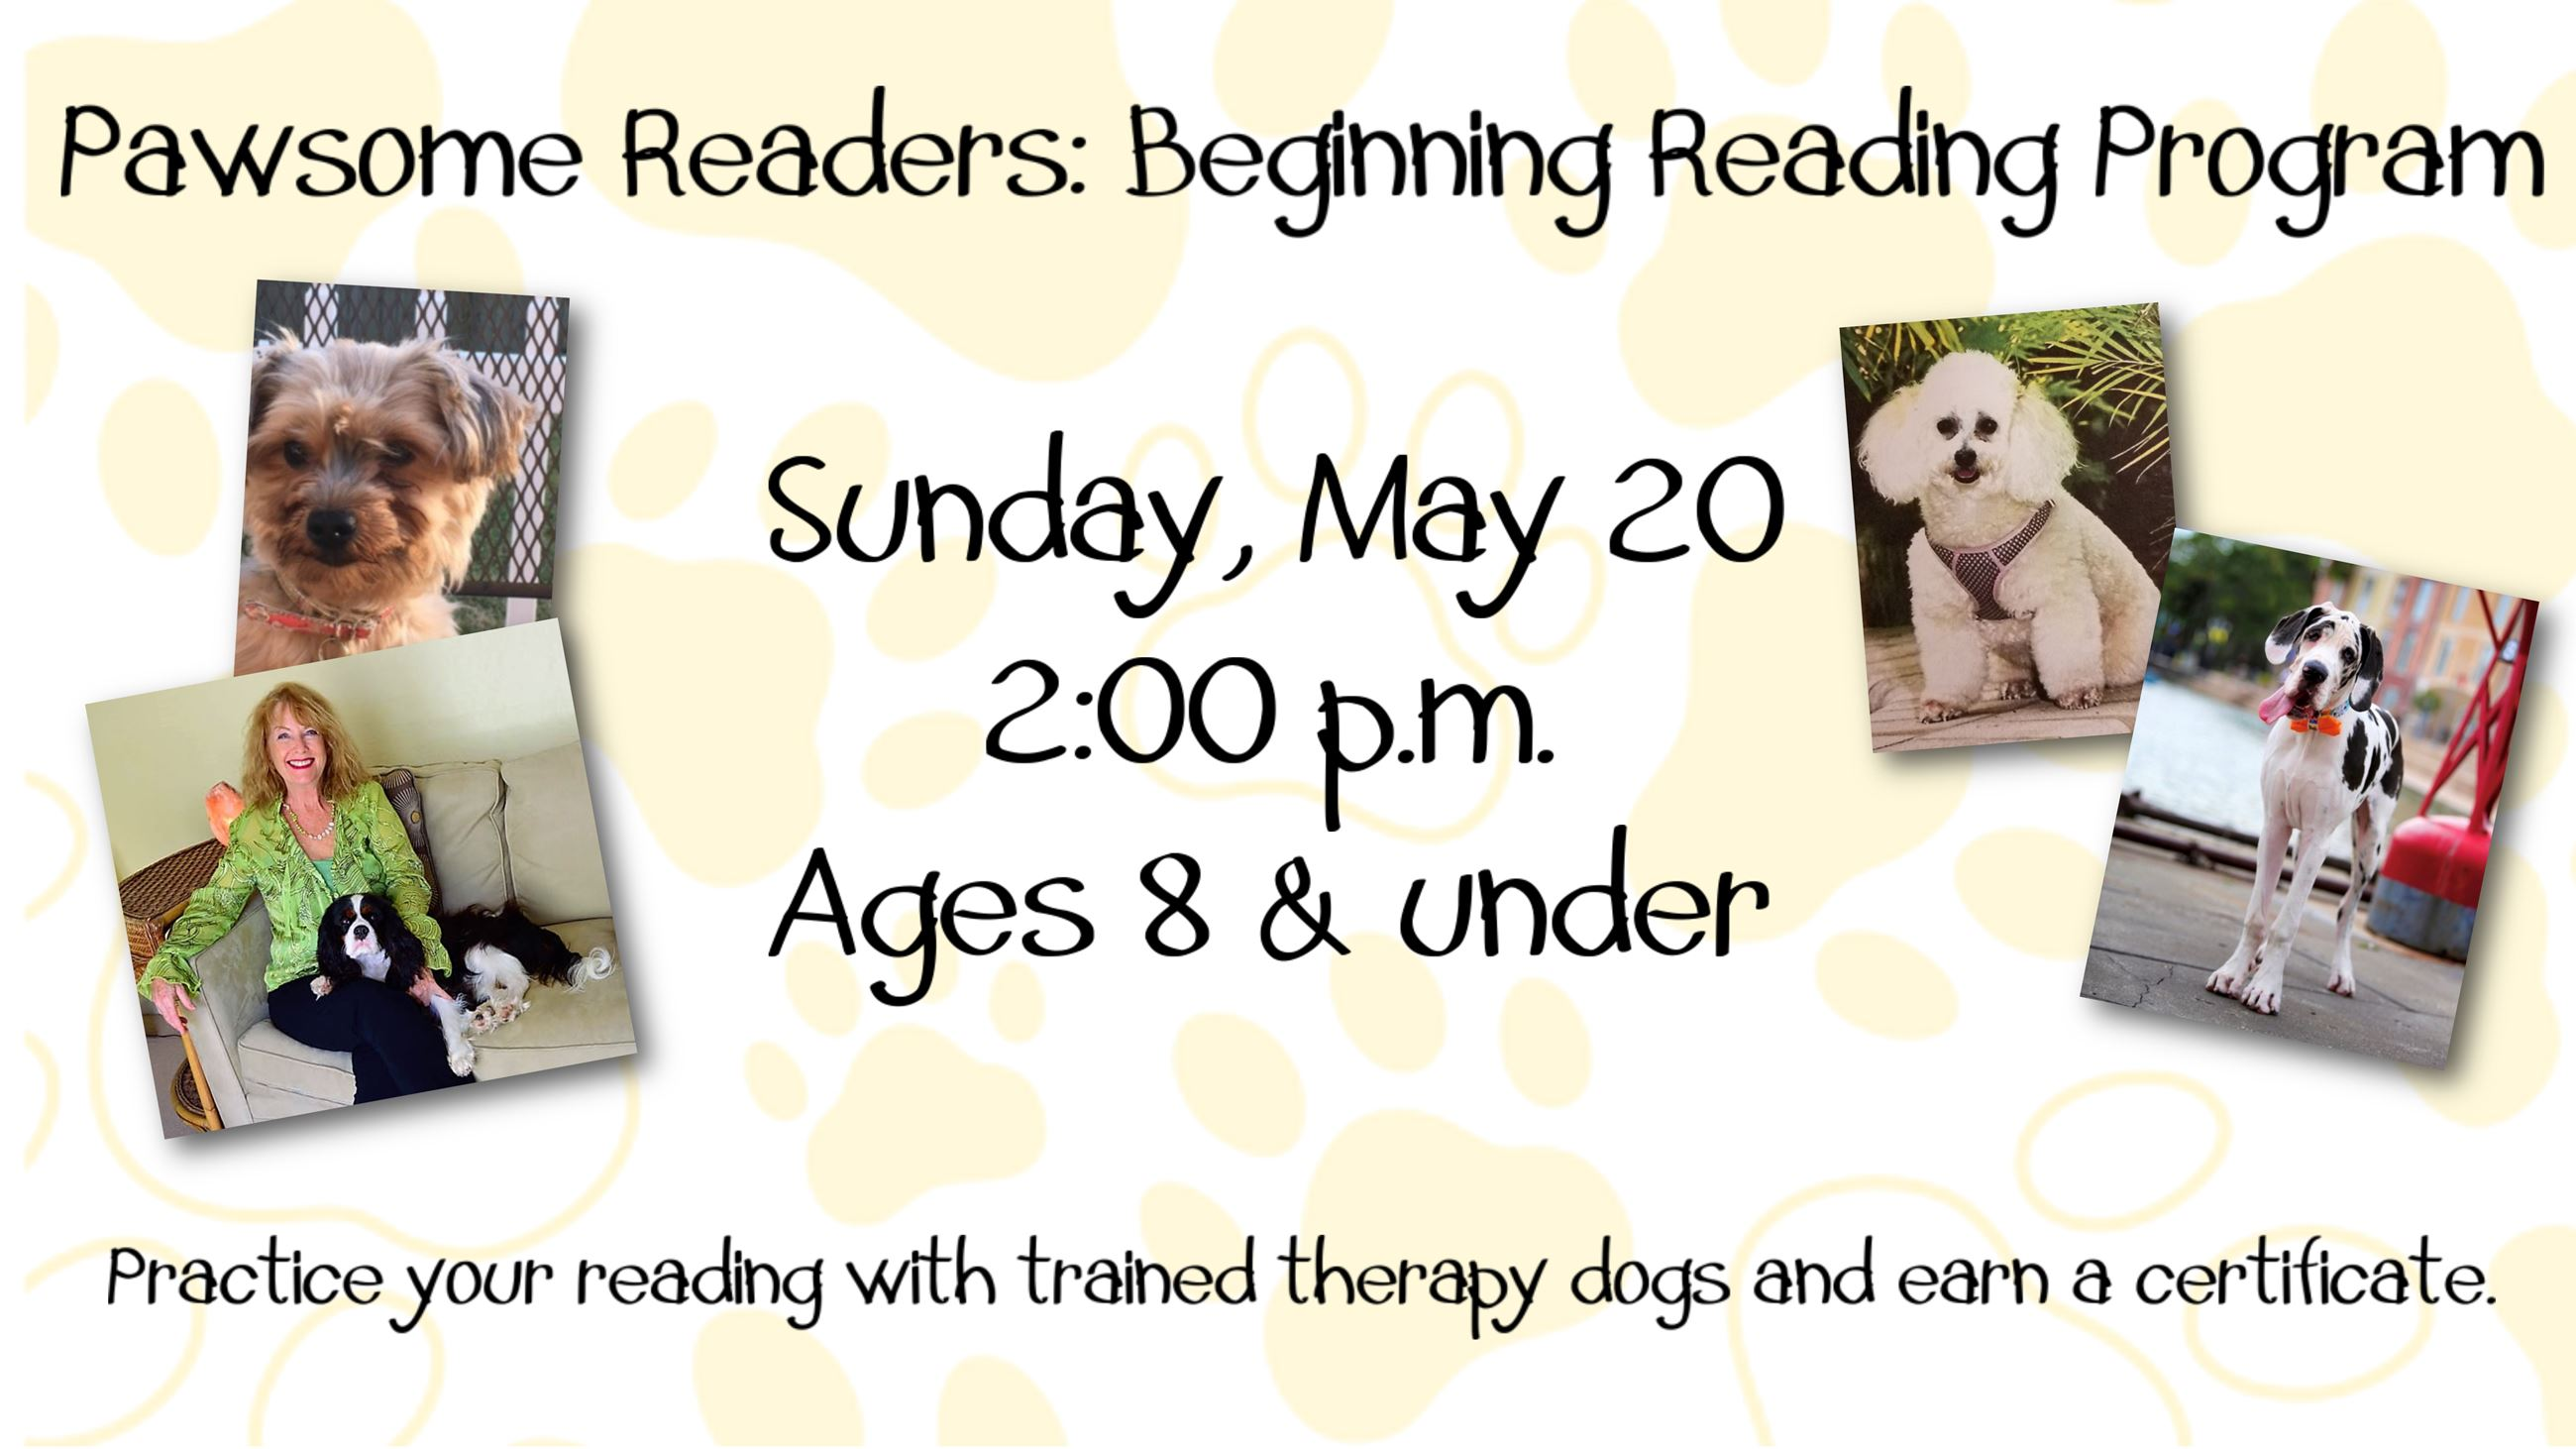 Pawsome Raeders Beginning Reading Program.pub